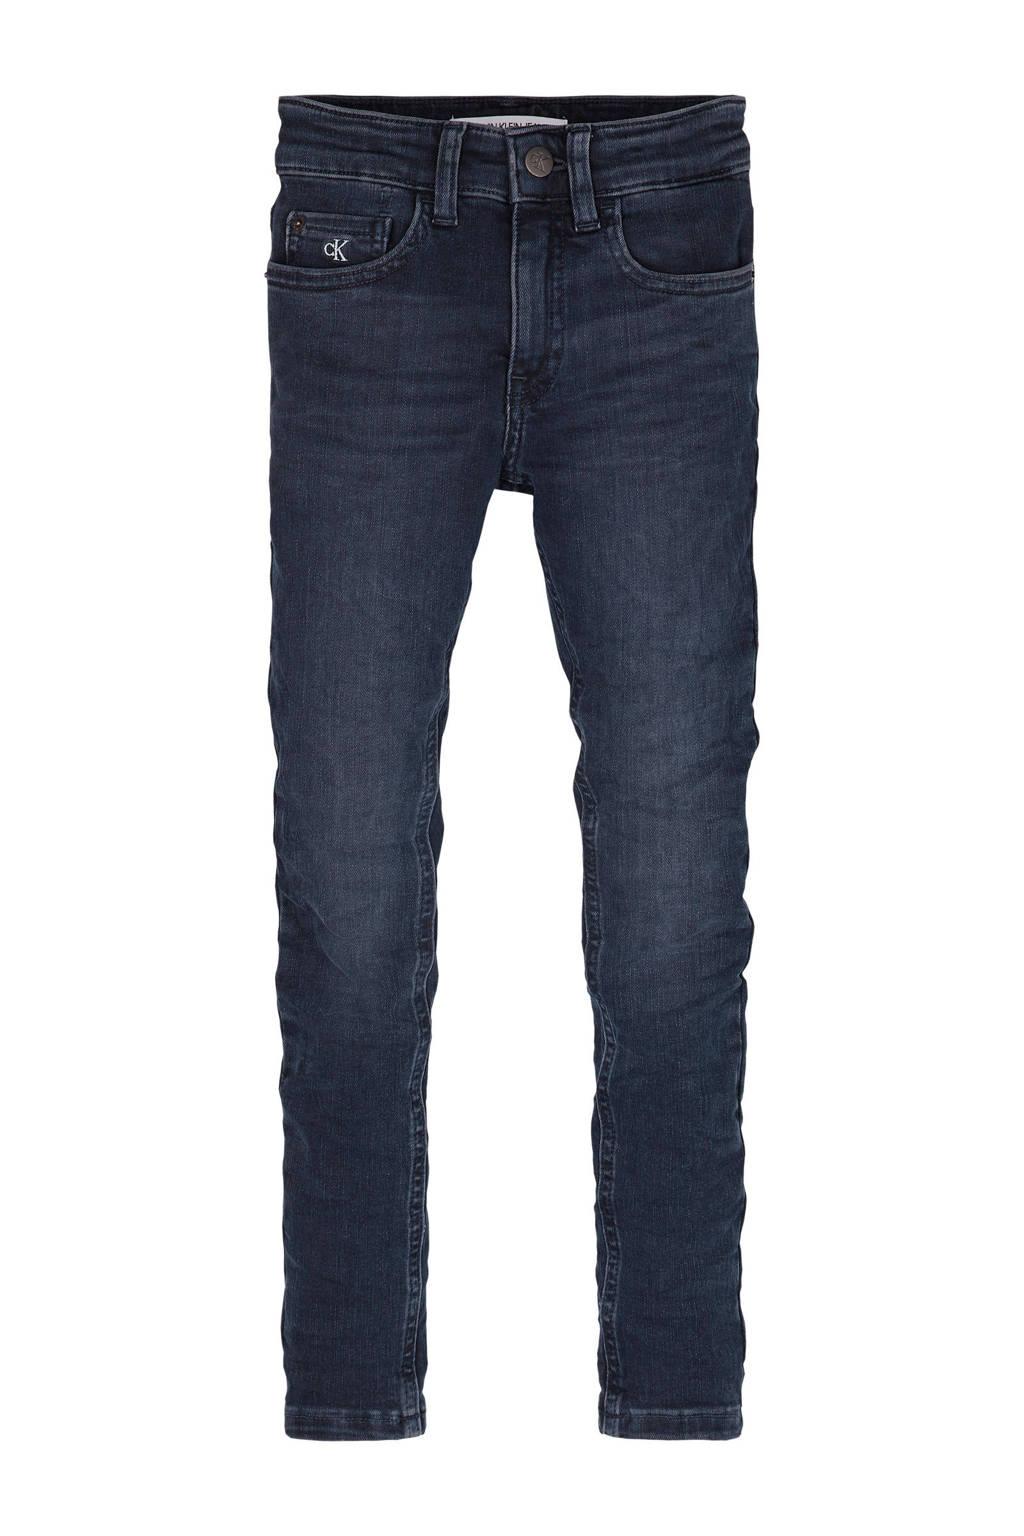 CALVIN KLEIN JEANS super skinny jeans dark denim, Dark denim